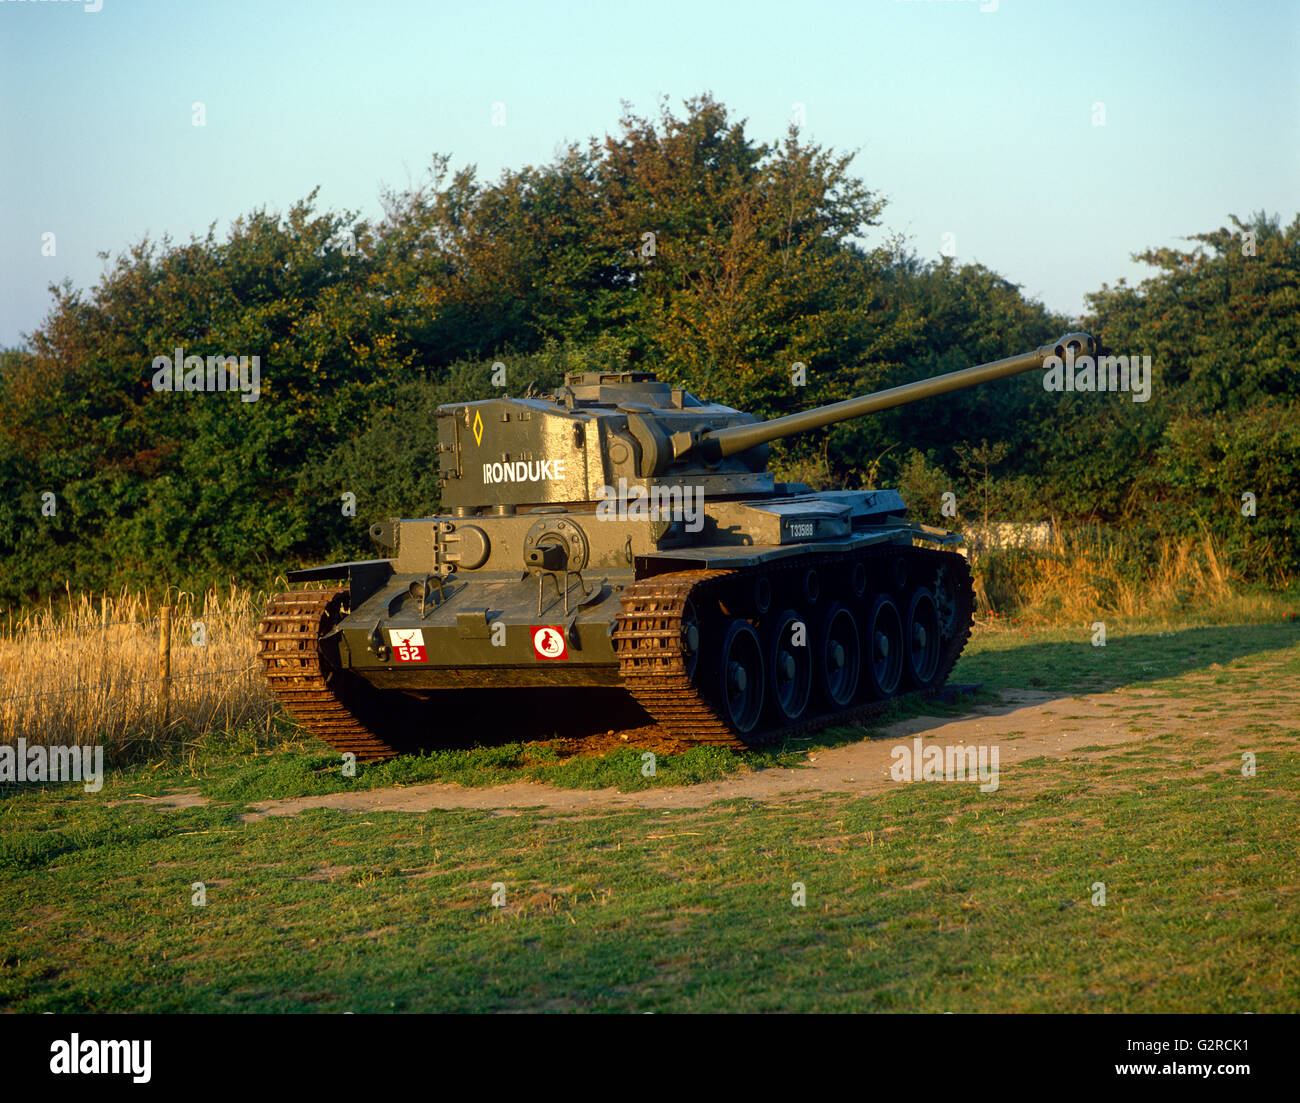 A British army tank - Stock Image